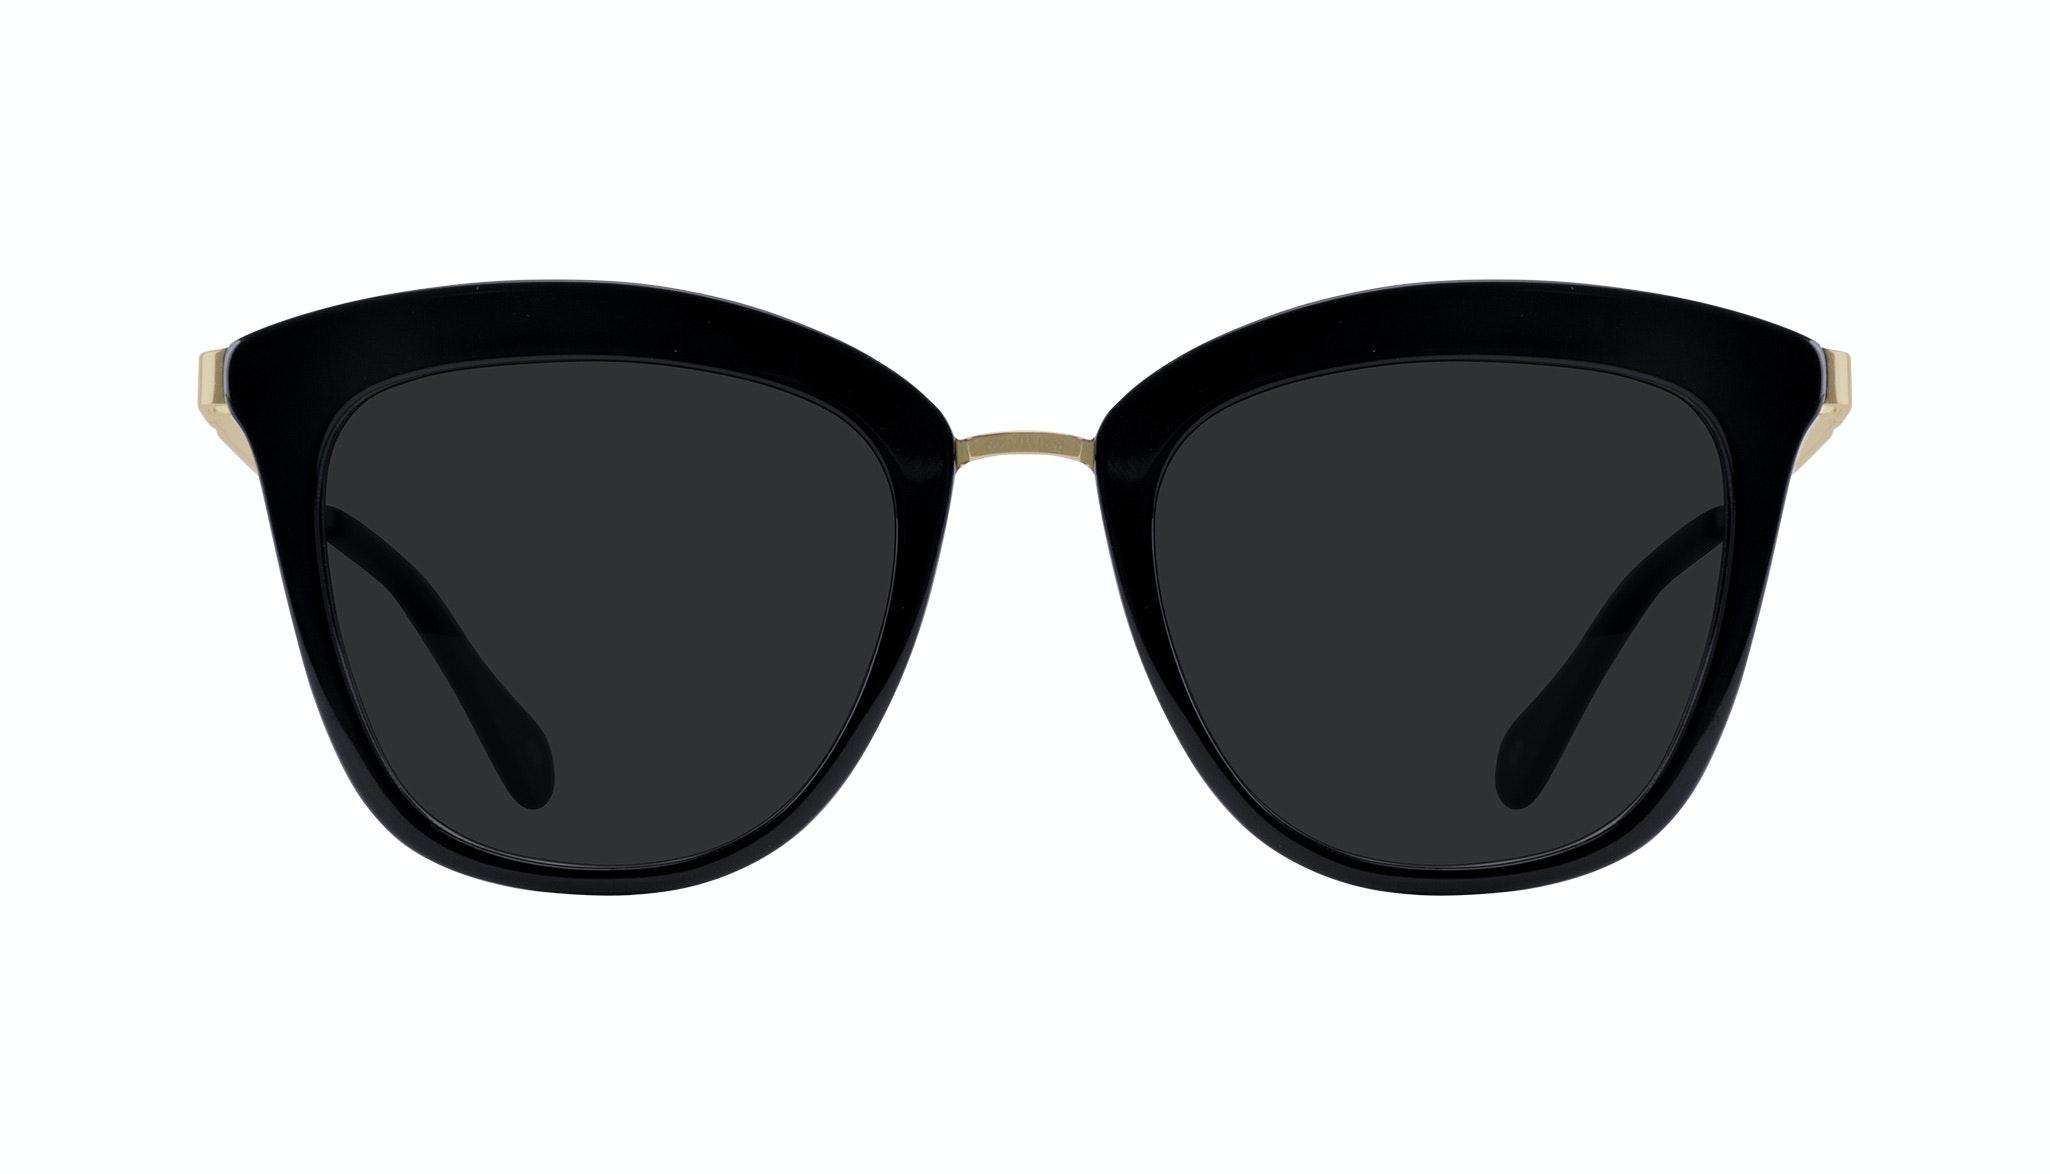 Affordable Fashion Glasses Rectangle Square Sunglasses Women More Onyx